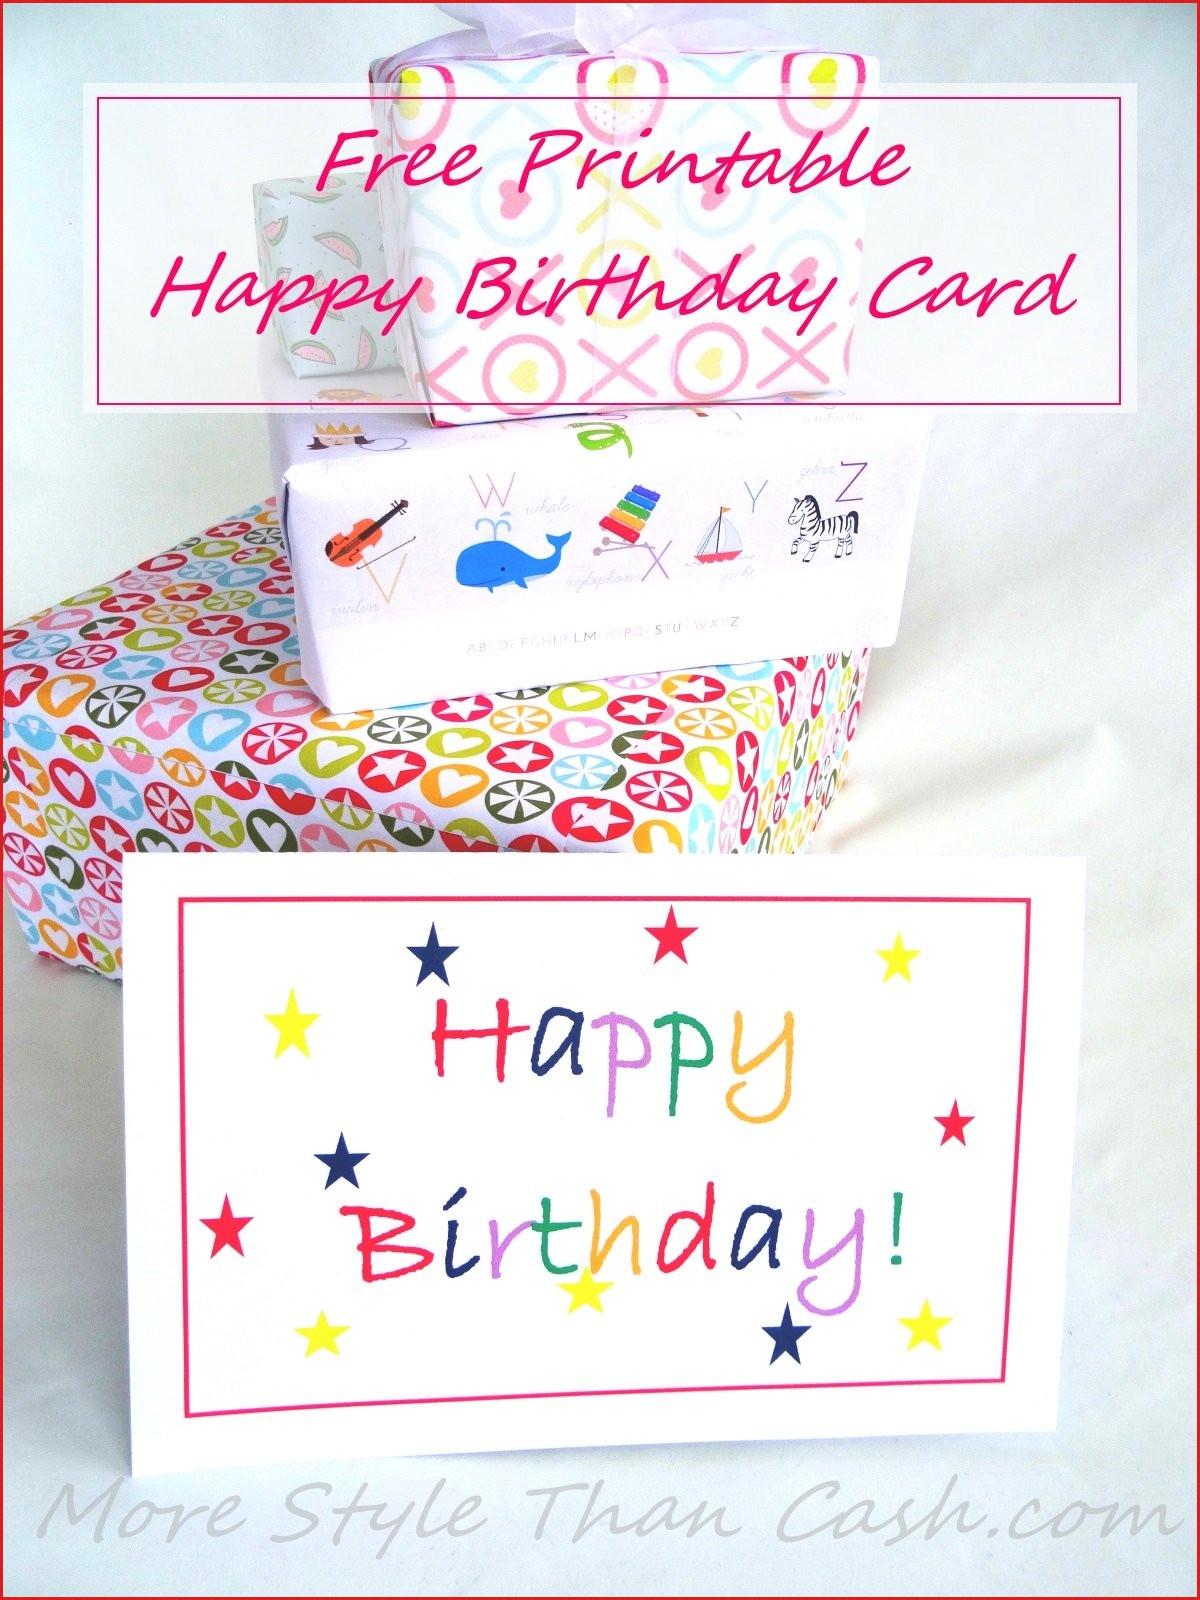 Free Printable Birthday Card Print Birthday Cards Online : Lenq - Free Printable Happy Birthday Cards Online